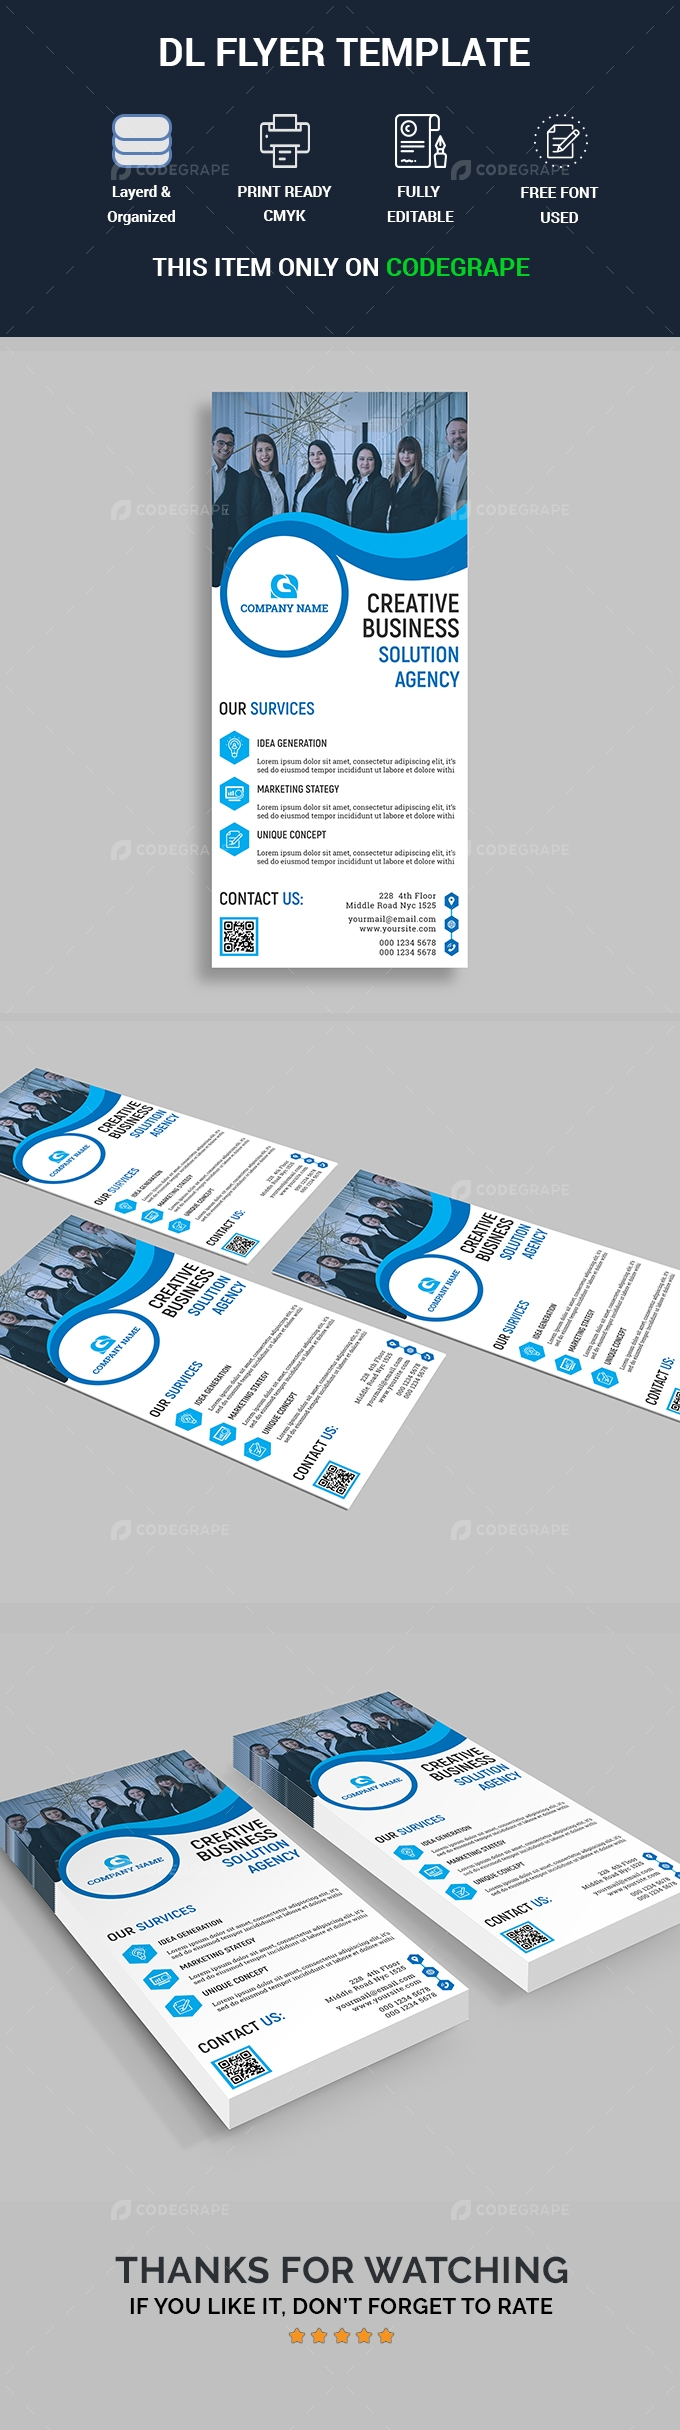 Creative DL Flyer Template